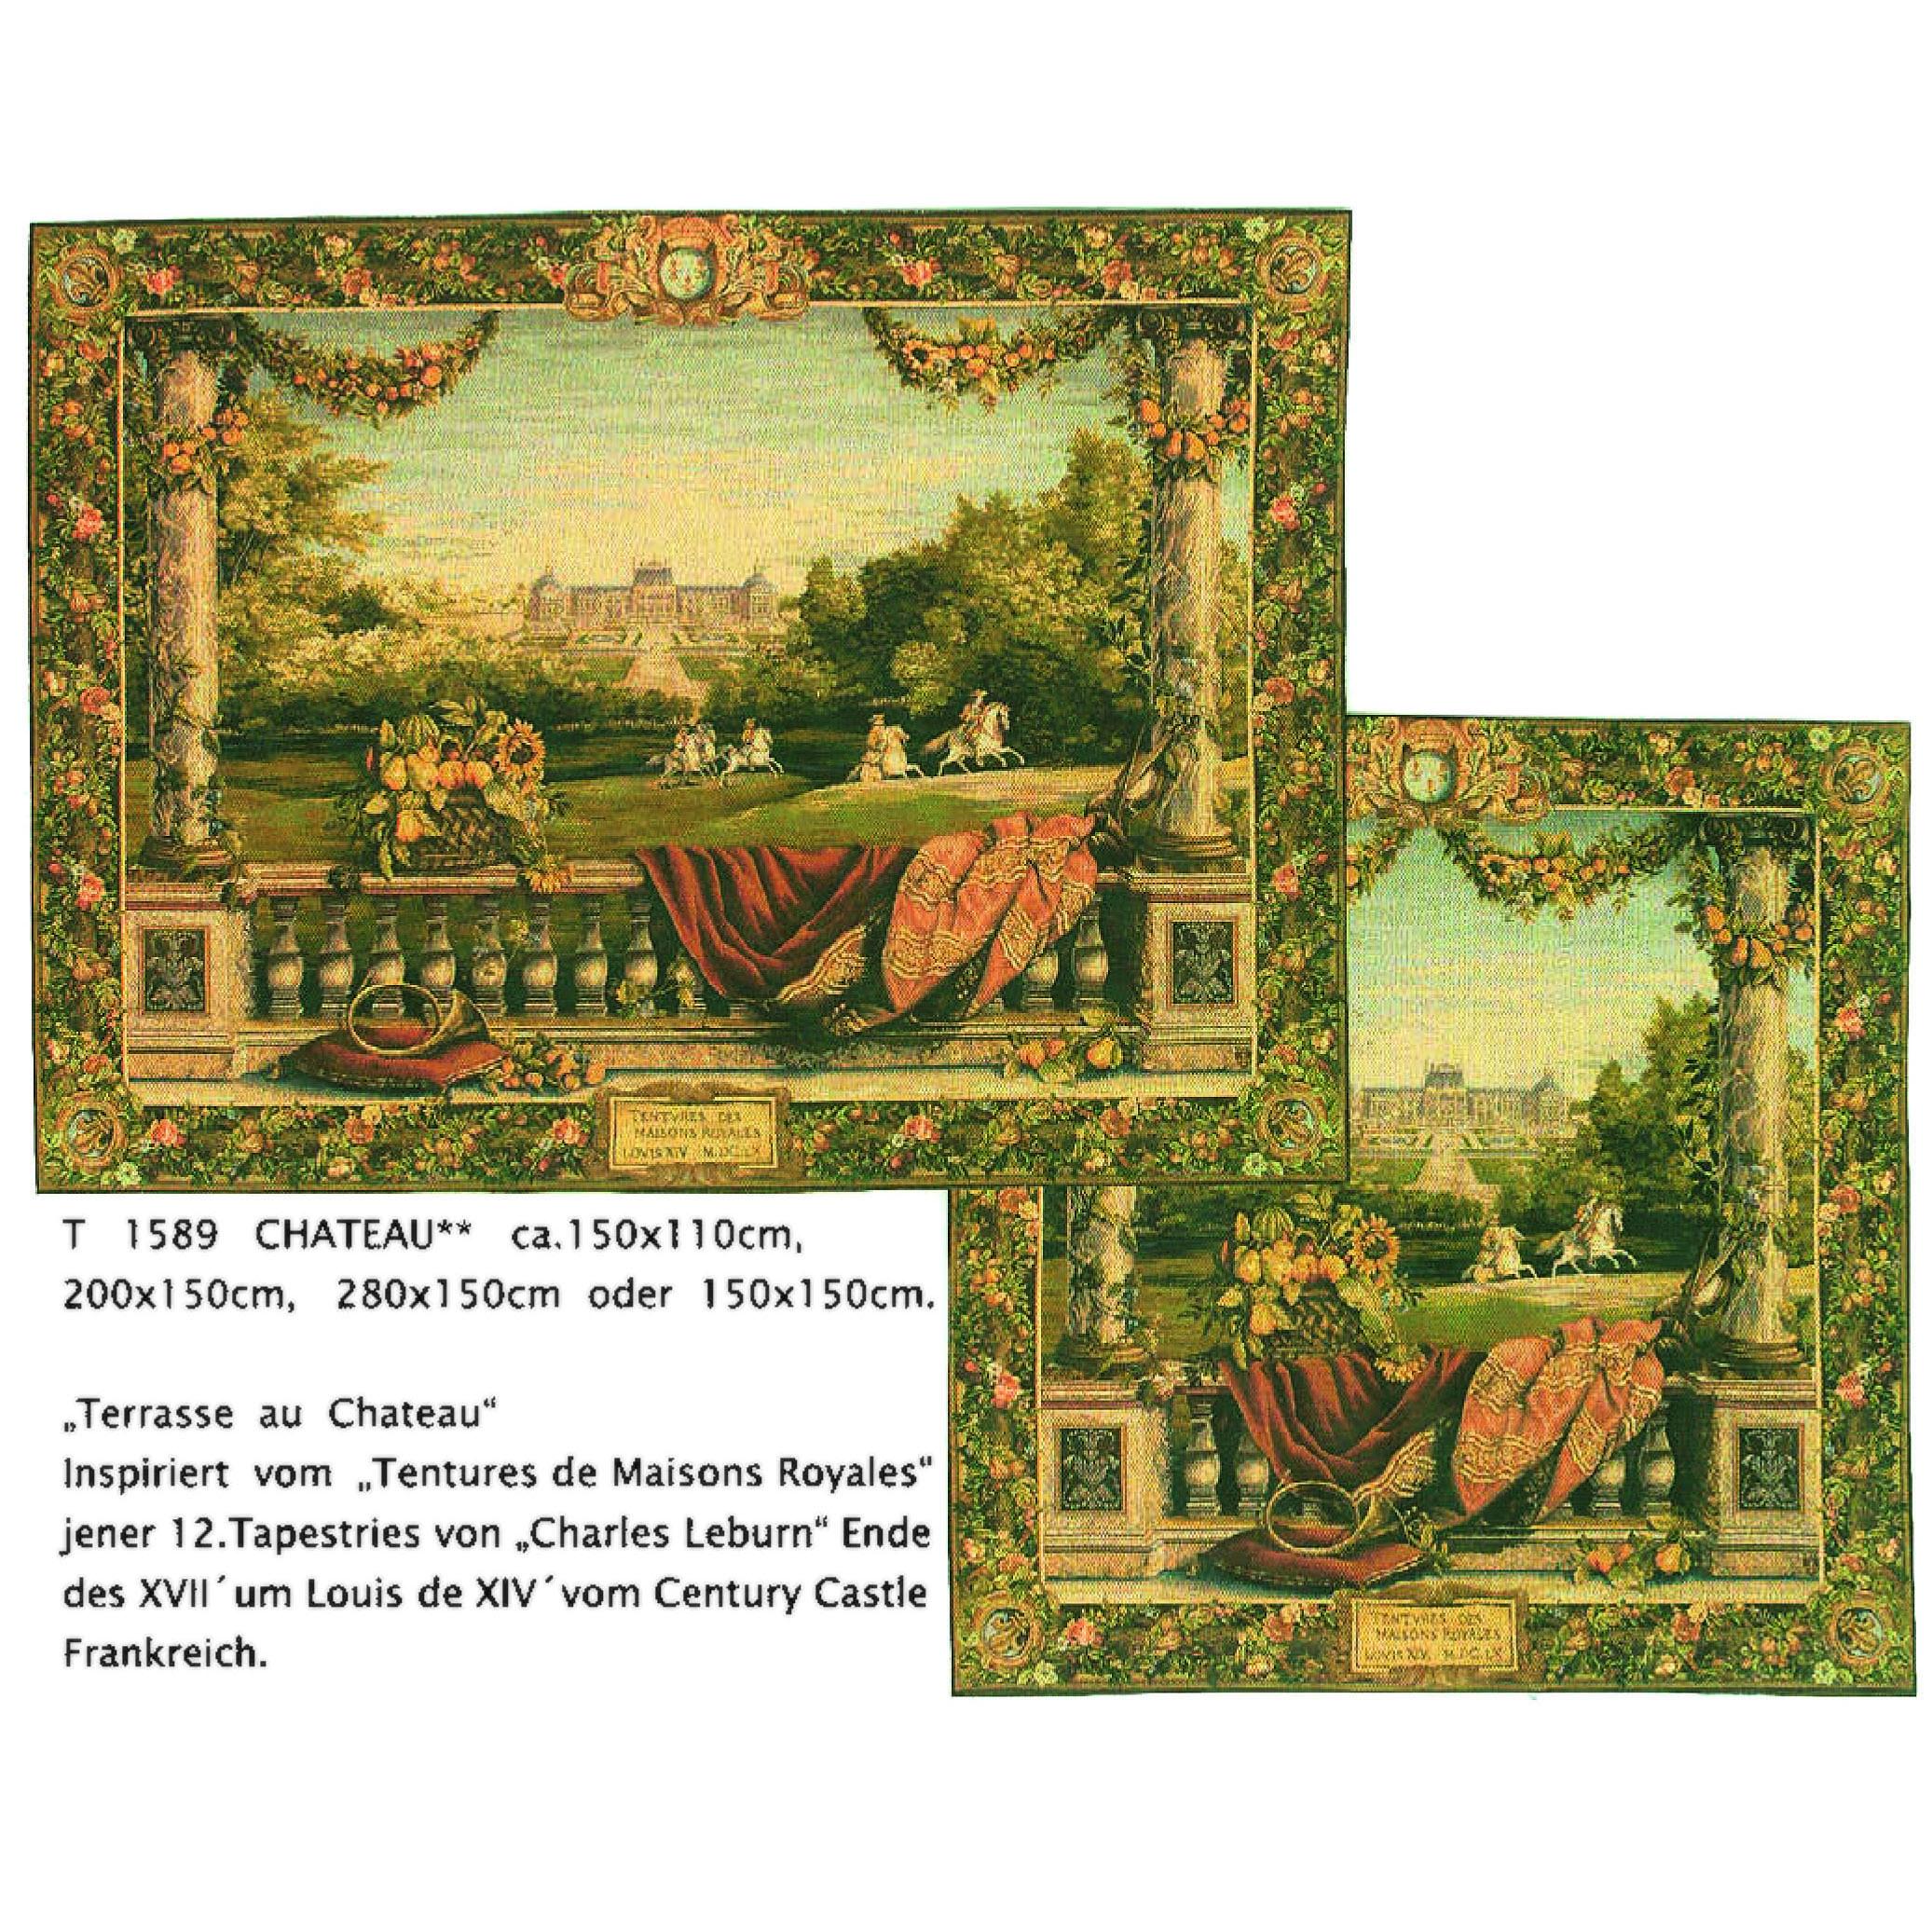 Luka, T1589 Chateau <br> Гобелен Шале <br>размеры 150х110, 200х150, 280х150, 150х150